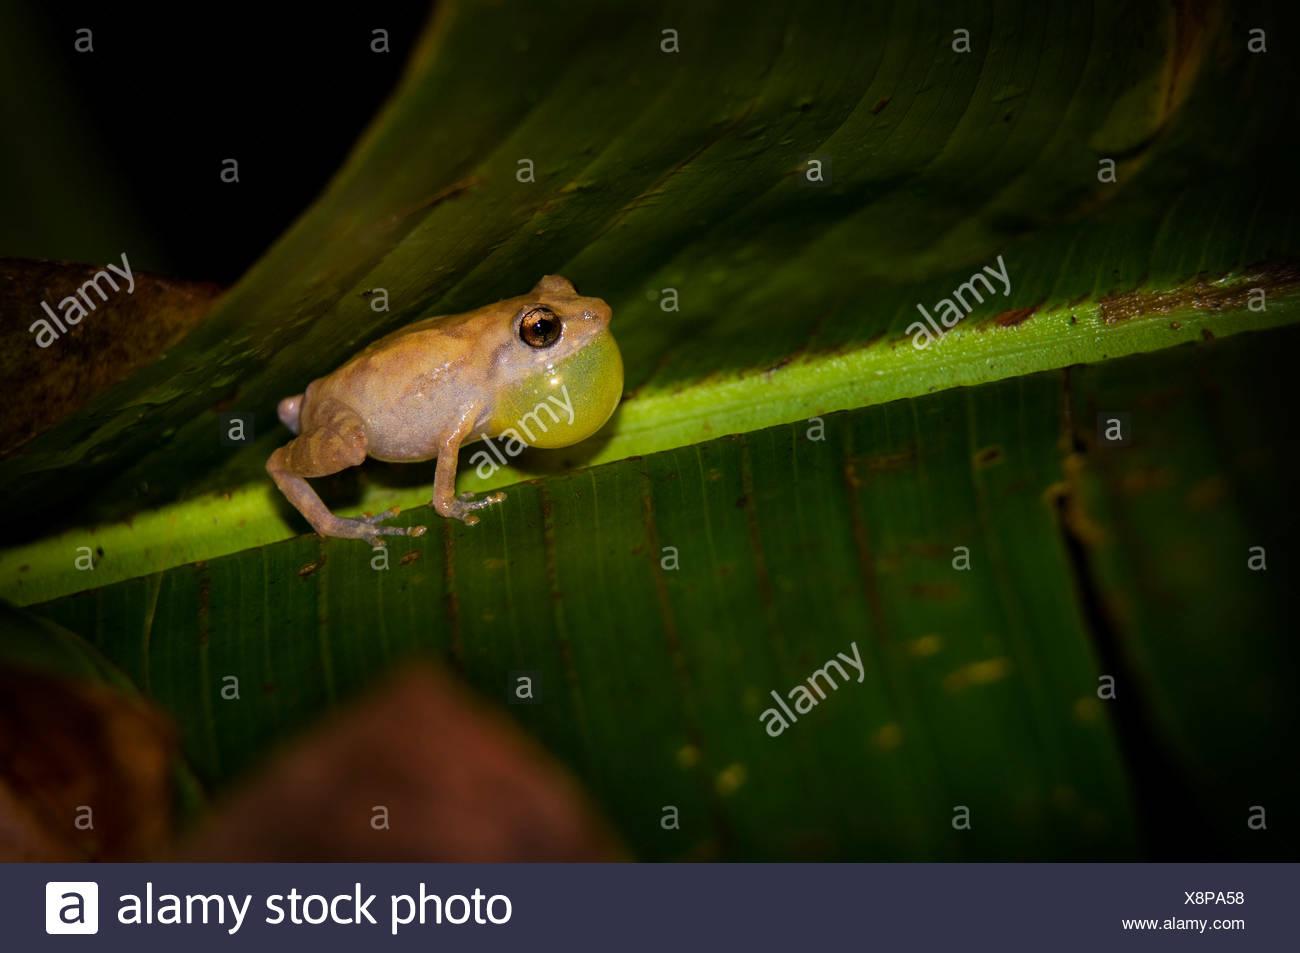 Frog on a leaf - Stock Image